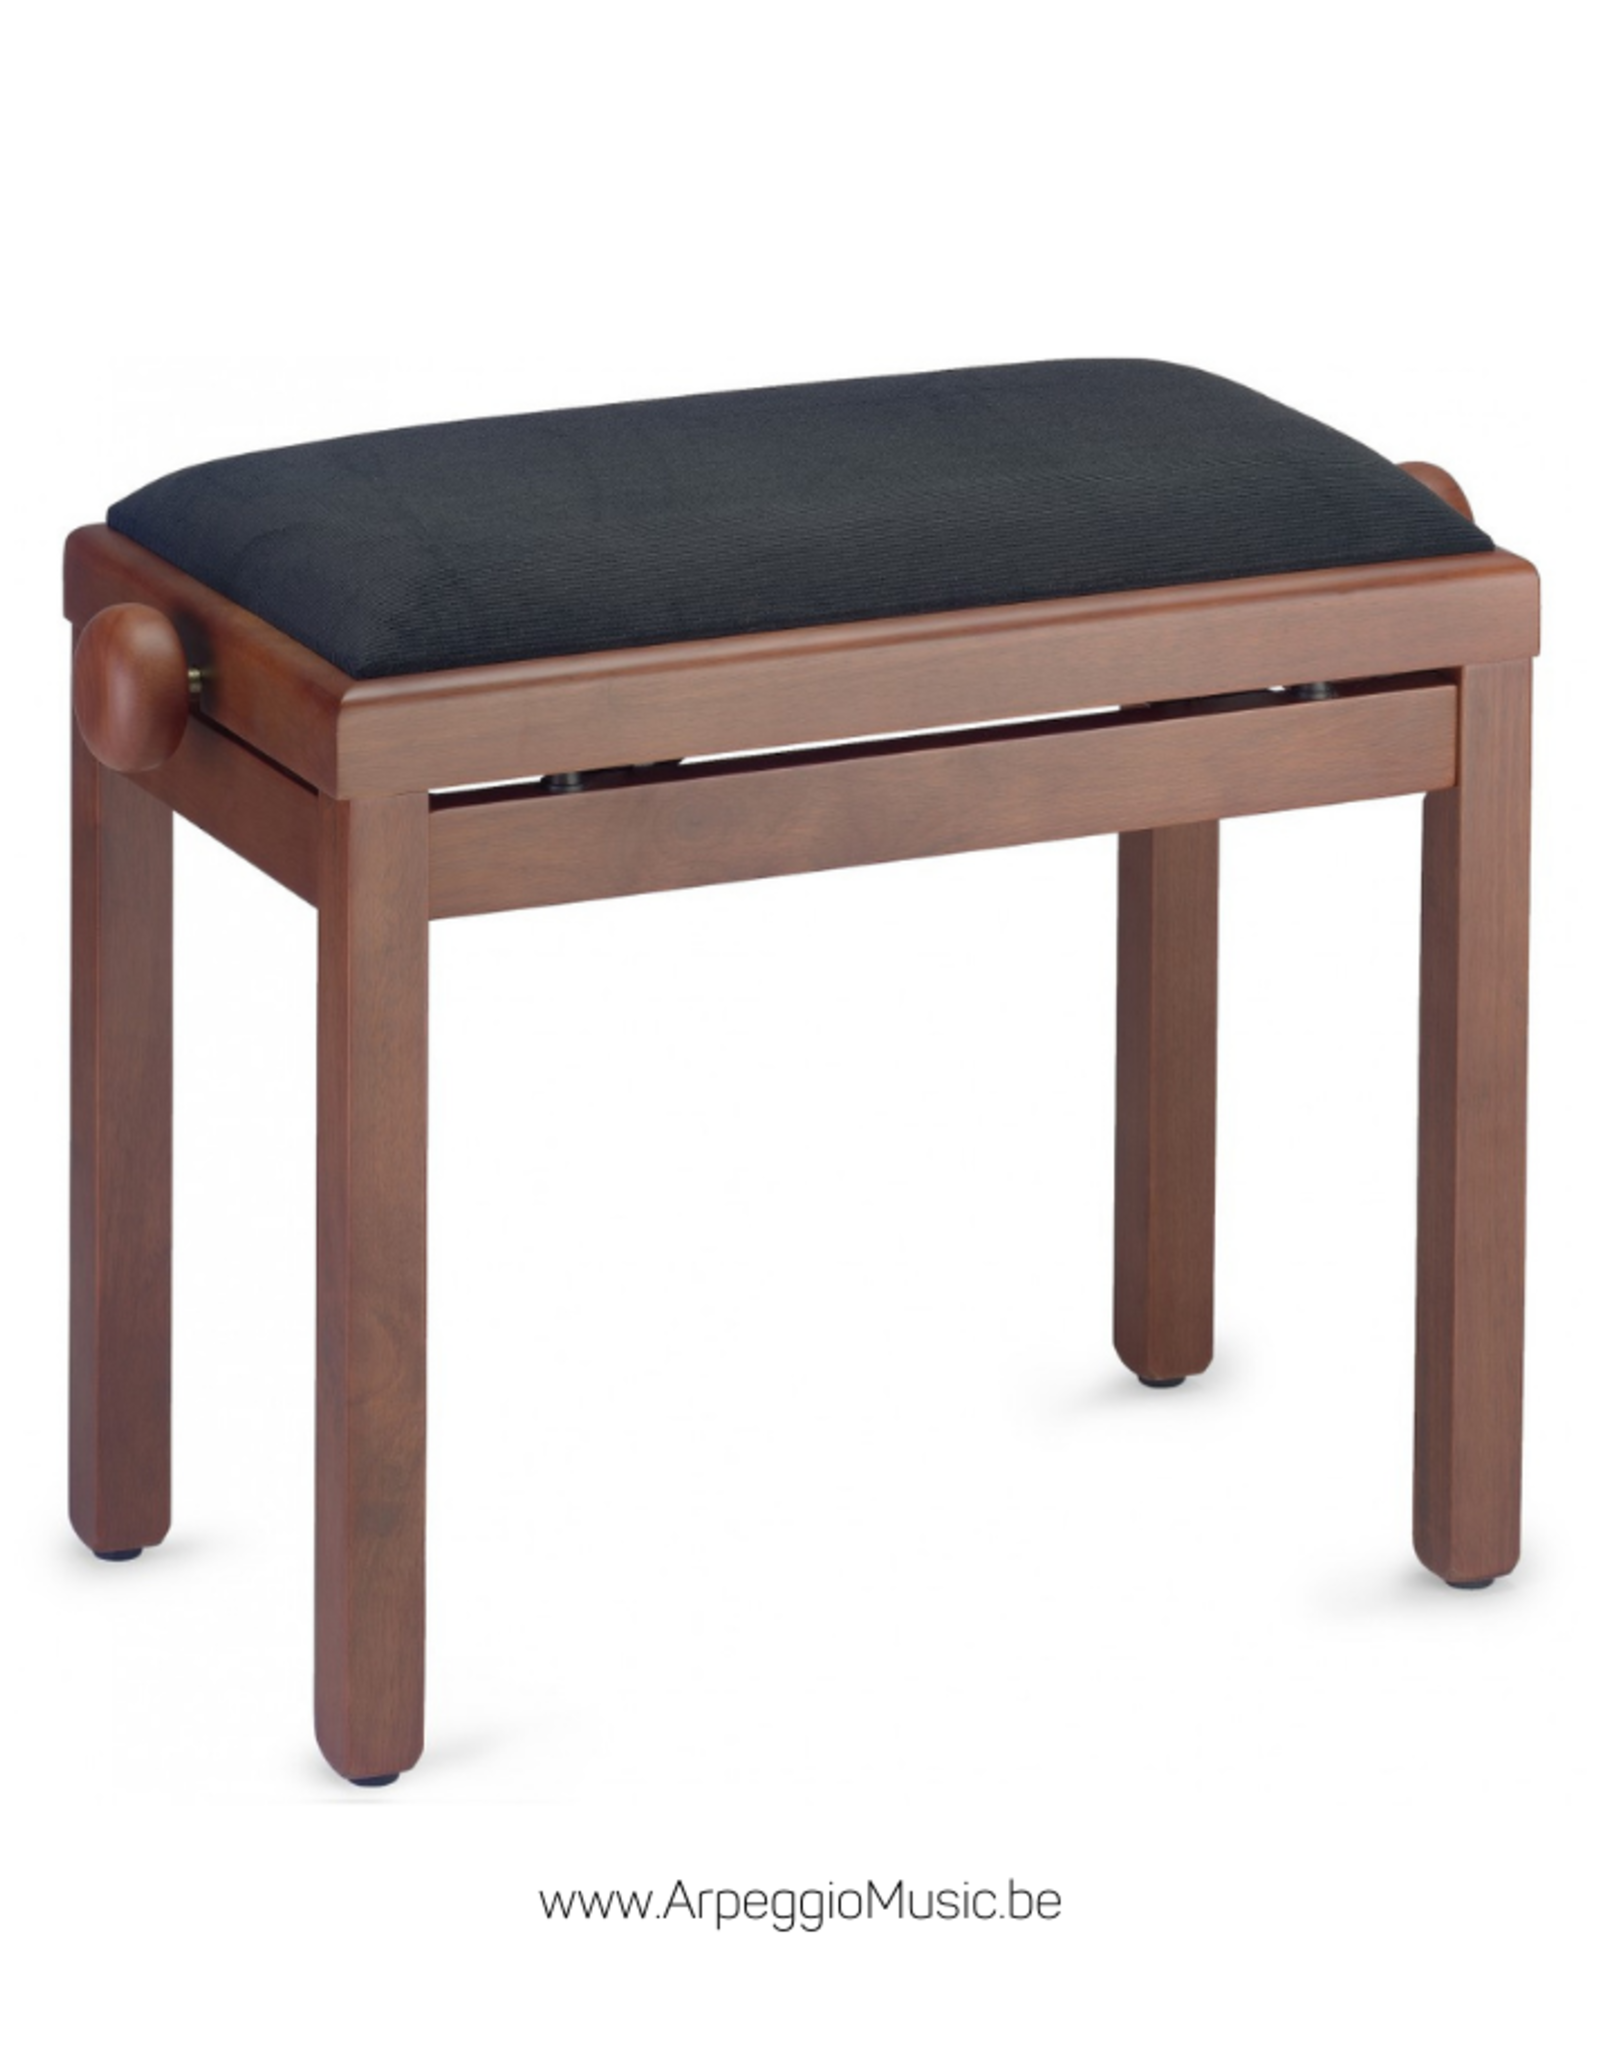 stagg Houten bank/stoel mahonie *